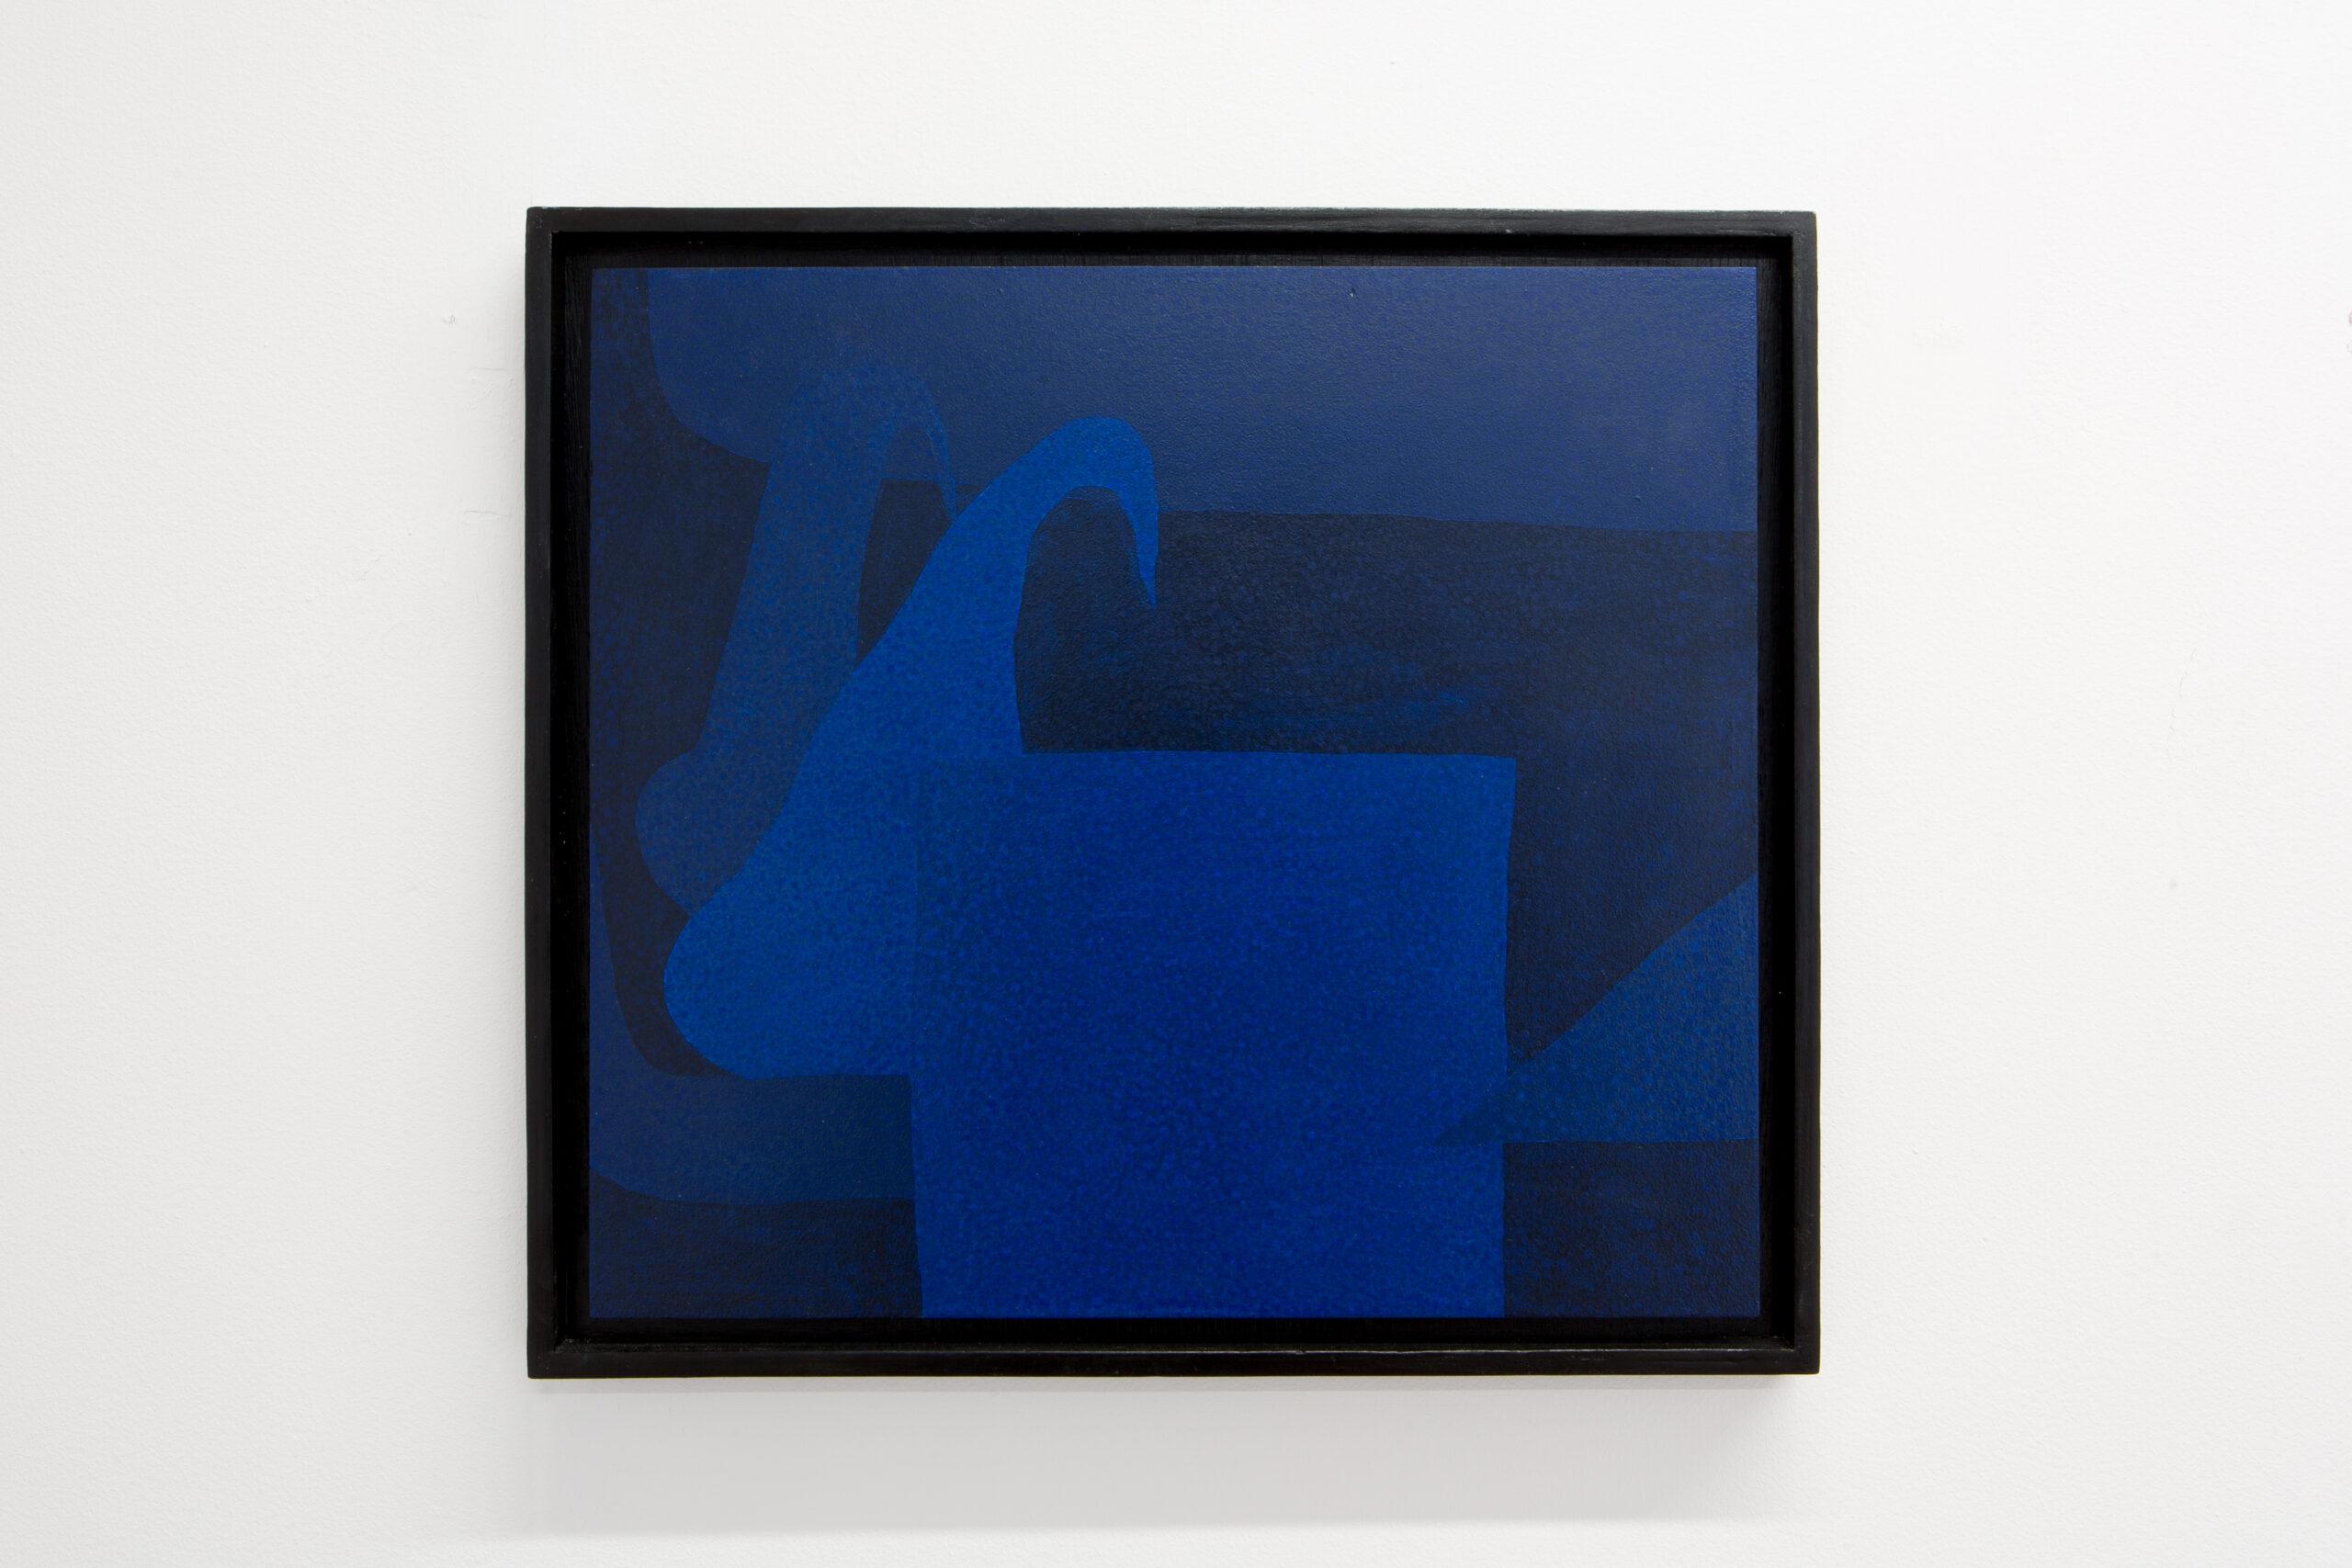 Jack Killick Creep (2020) Acrylic on board, 34 cm x 38 cm Float mounted and framed.